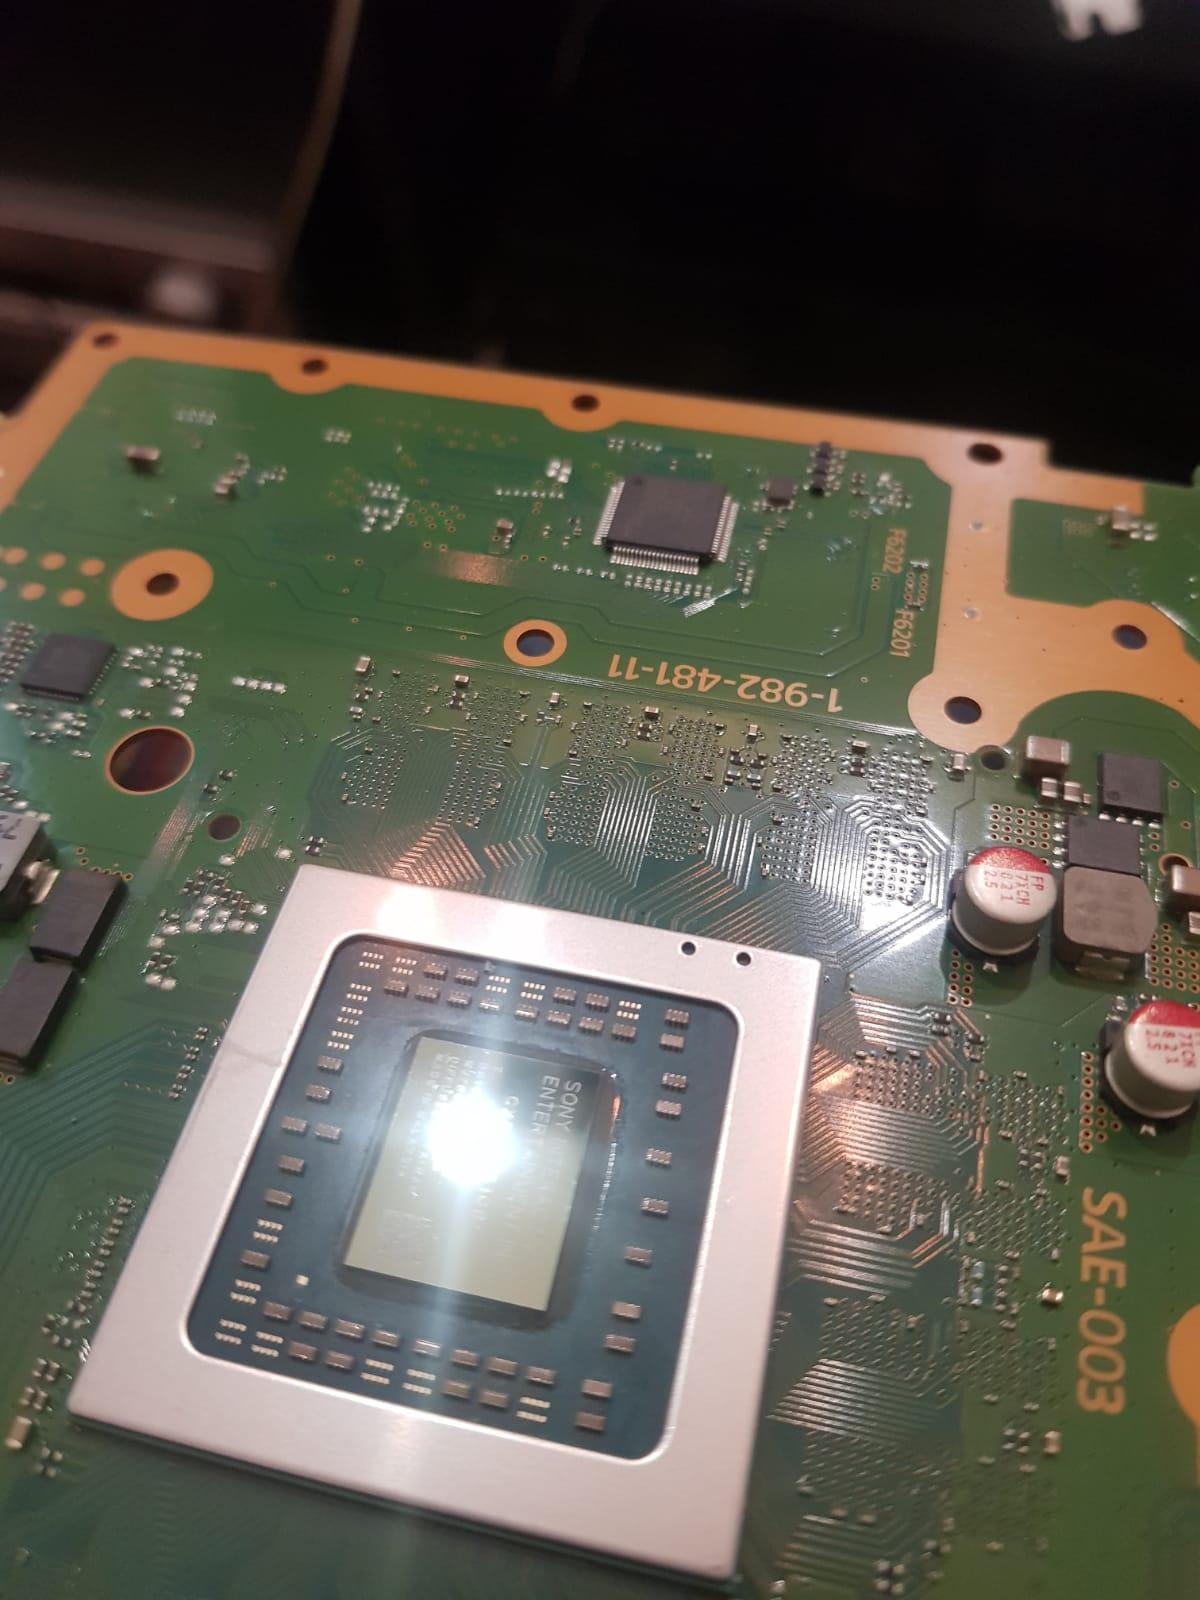 Curatare praf PS4 Slim, inlocuire pasta termoconductoare consola PlayStation 4 , Slim si PRO. Reducere zgomot ventilator 0773727567